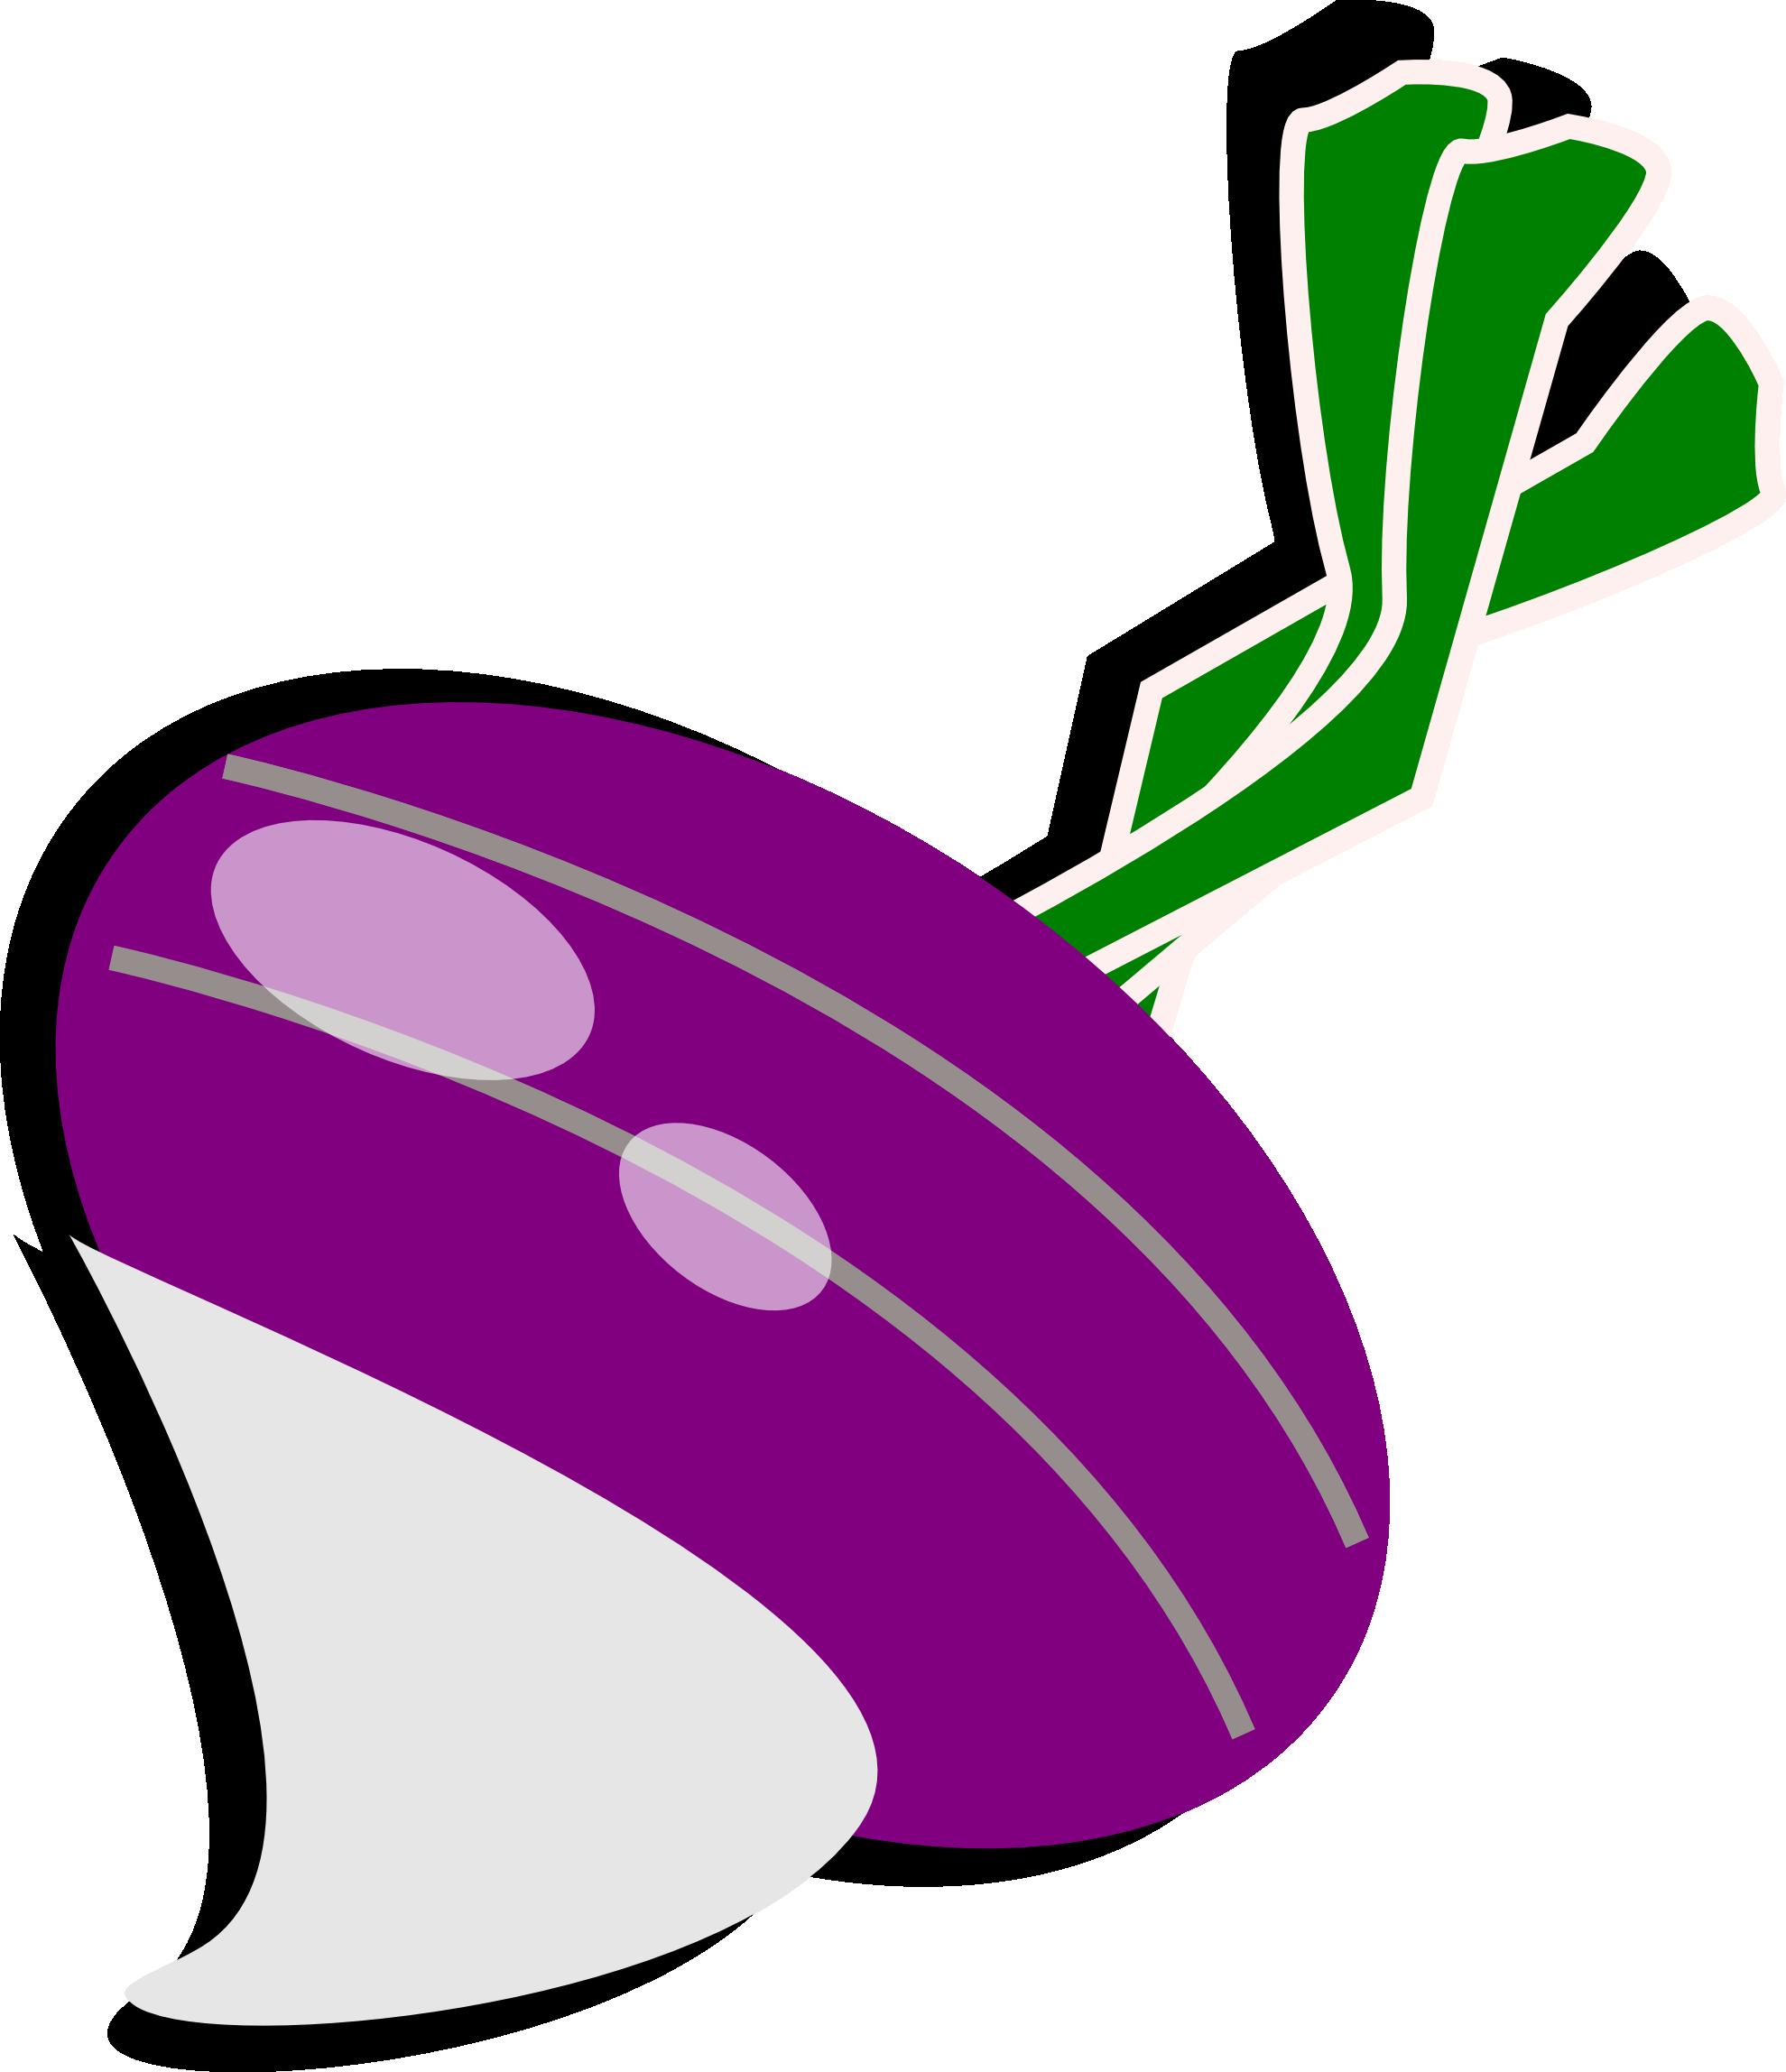 Turnip Clipart-turnip clipart-1